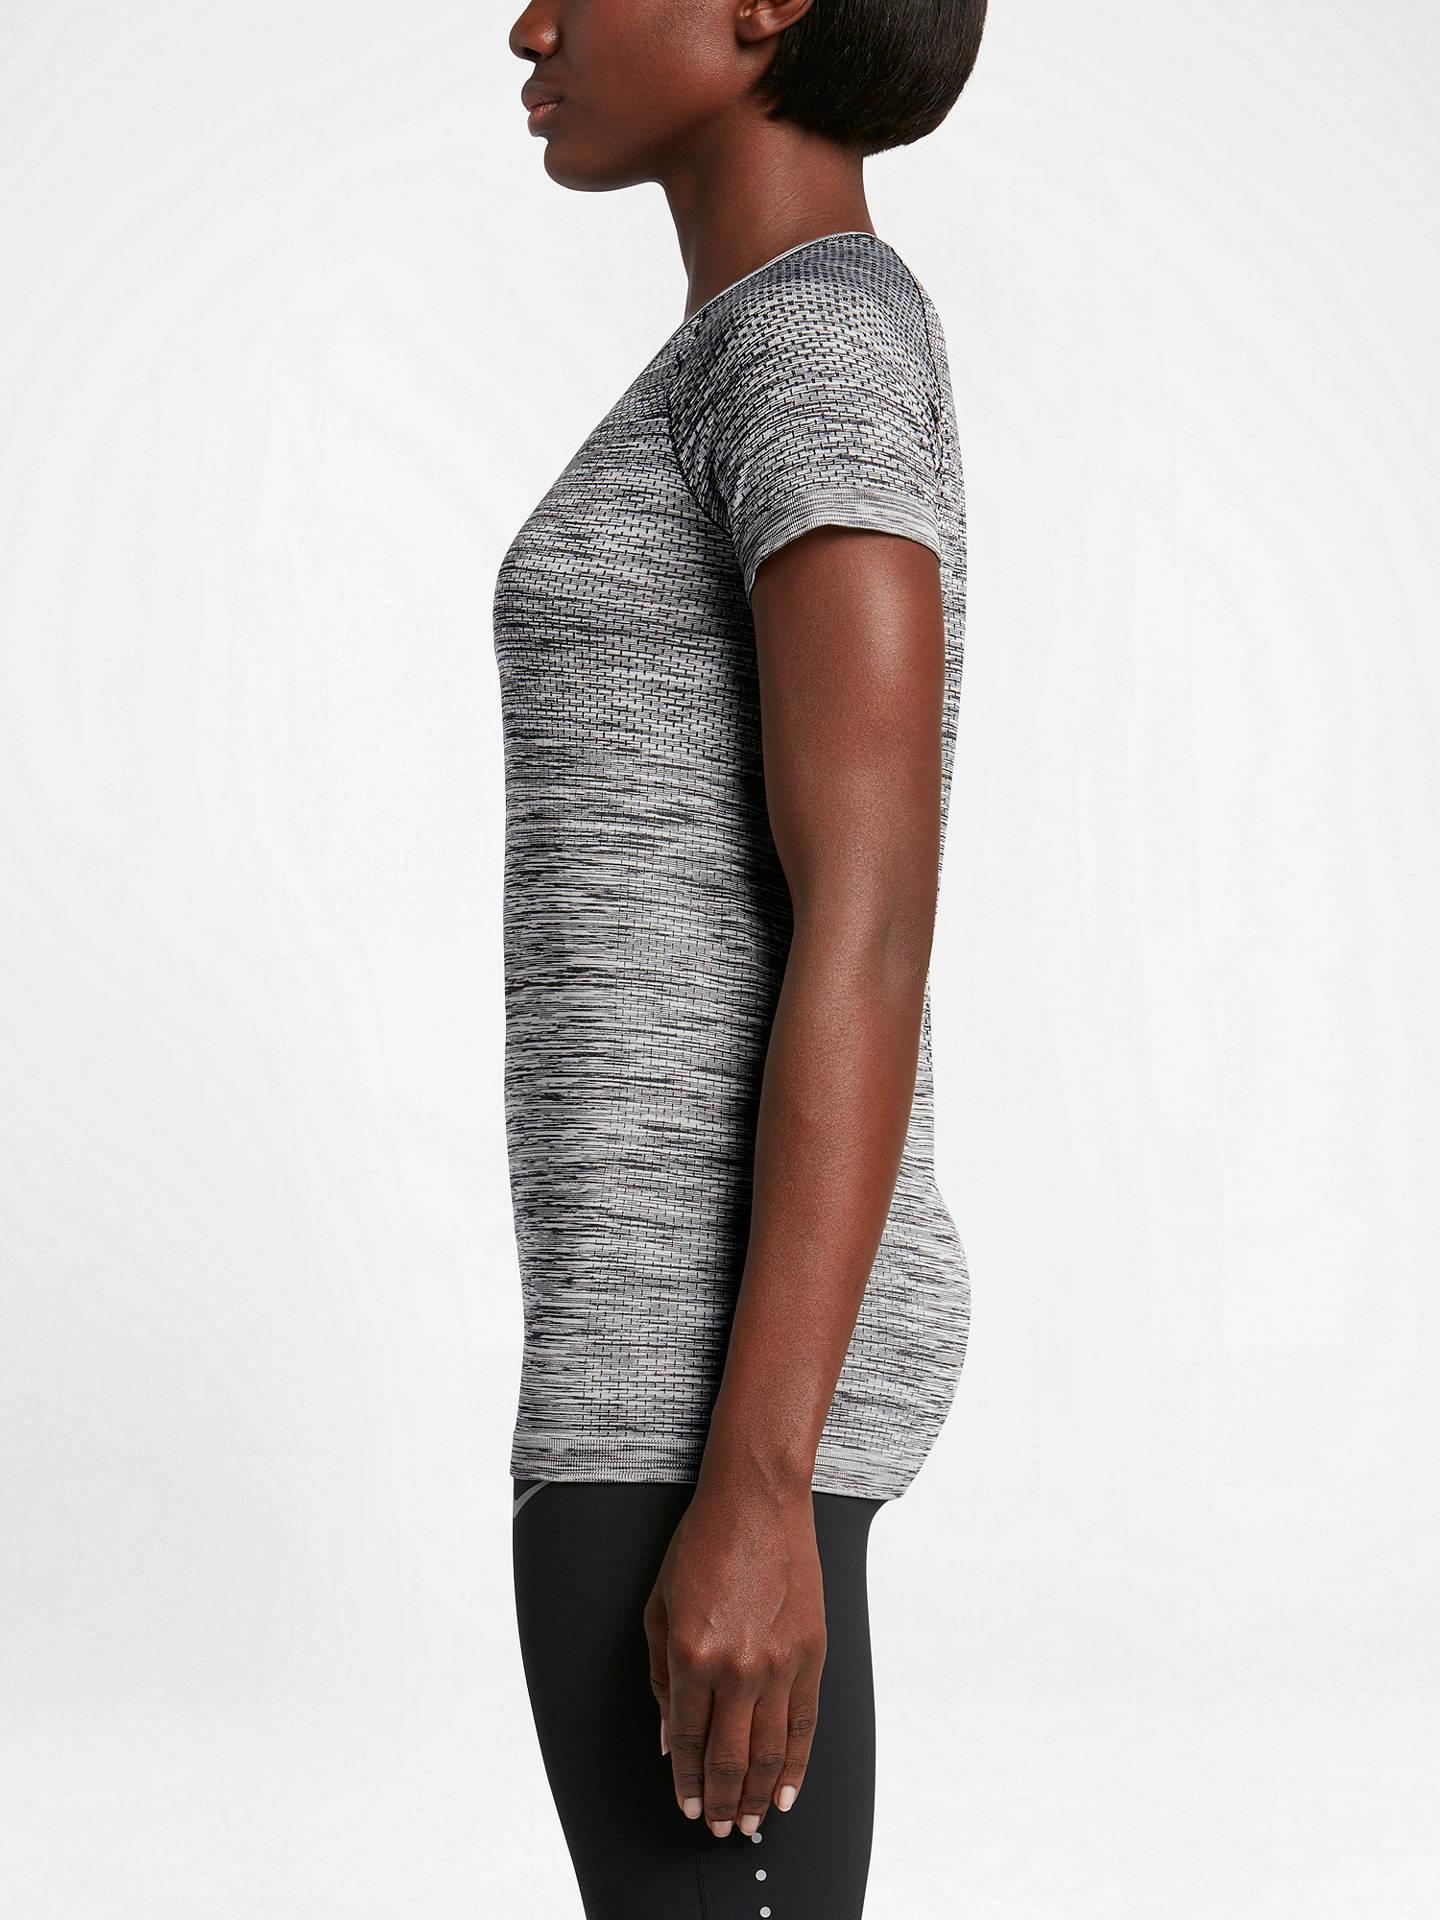 420ea201 Nike Dri-FIT Knit Short Sleeve Running Top at John Lewis & Partners